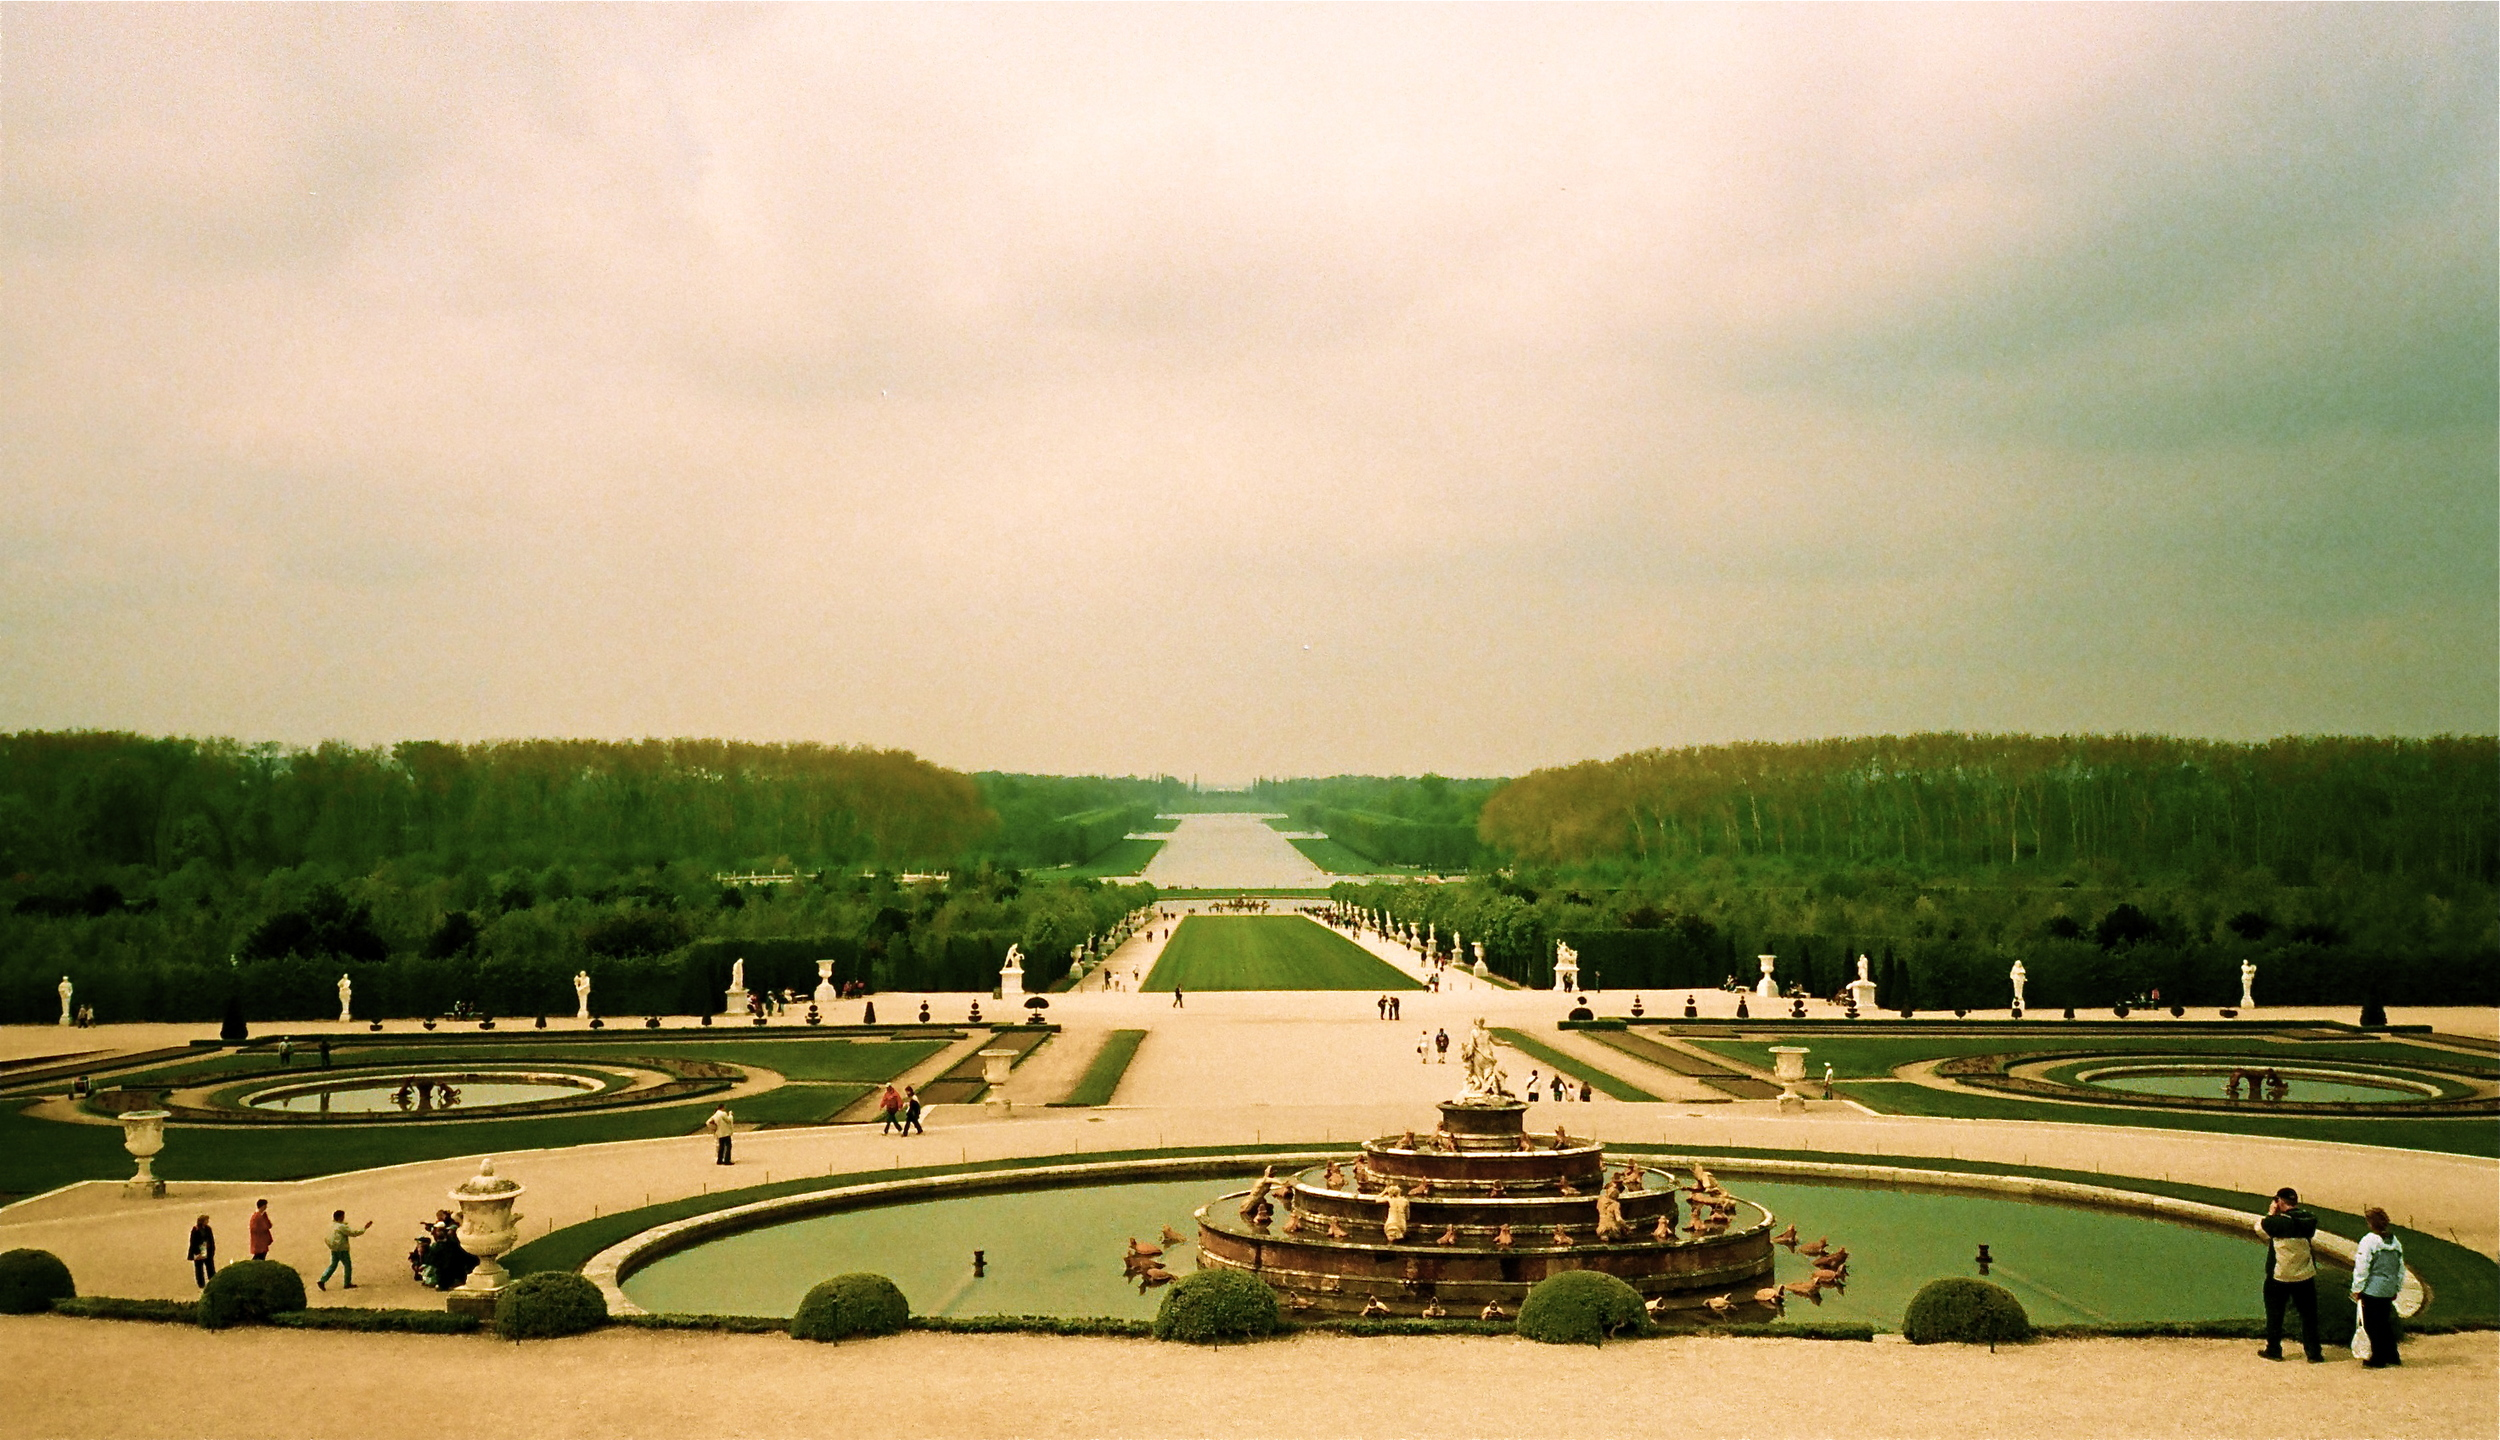 The Garden at Versailles